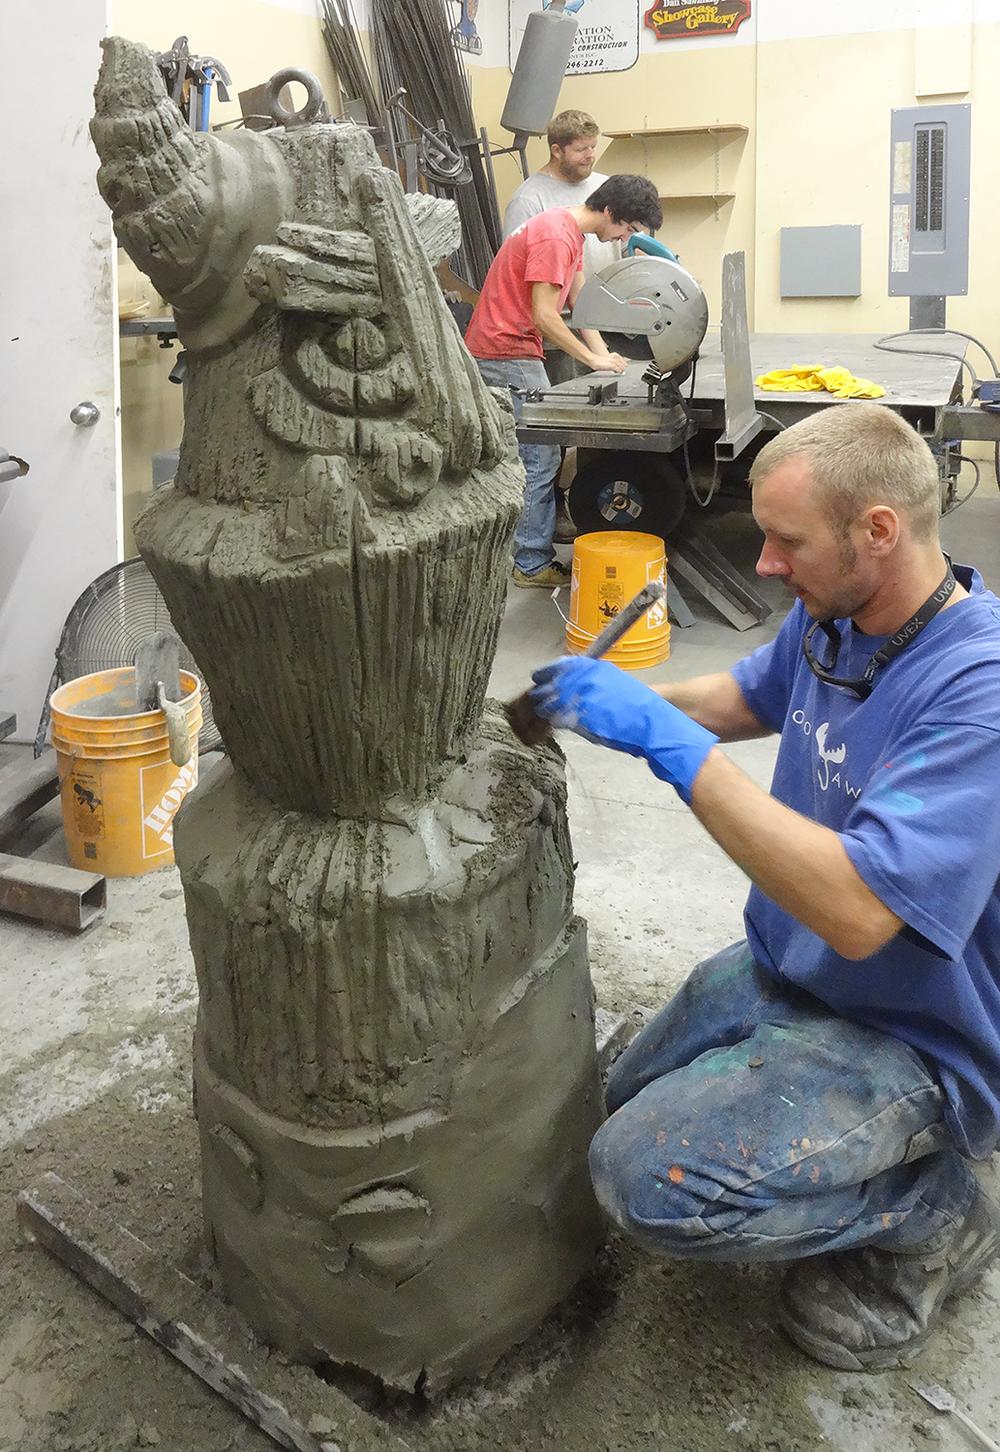 Carving a Tiki